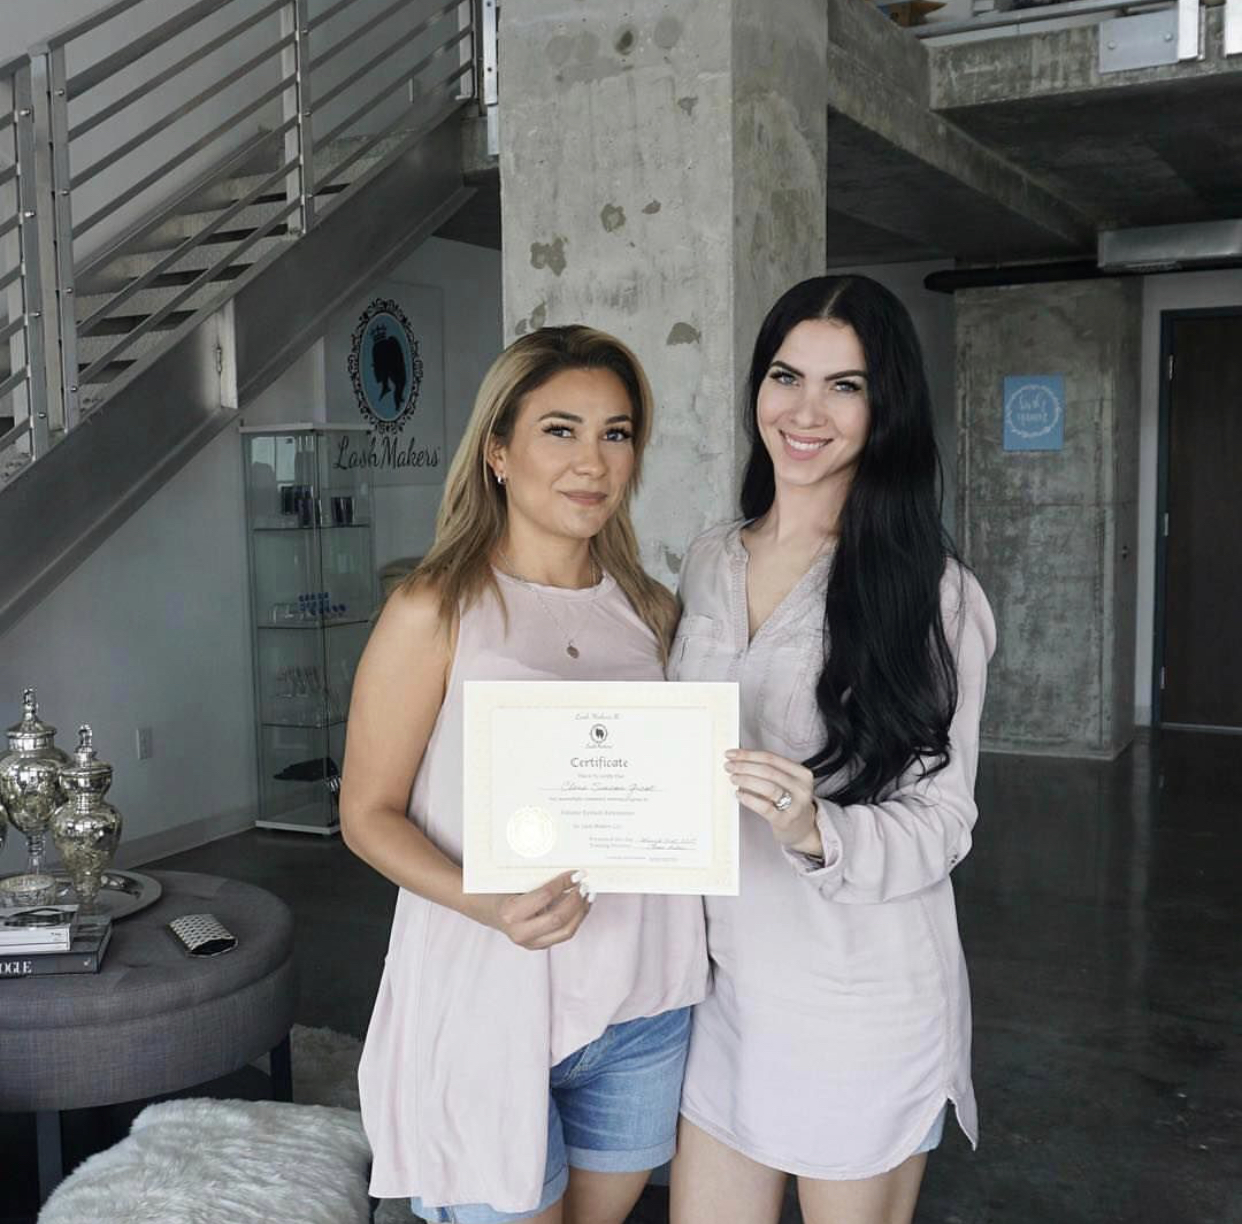 - Clara getting Lashmakers certified in Miami